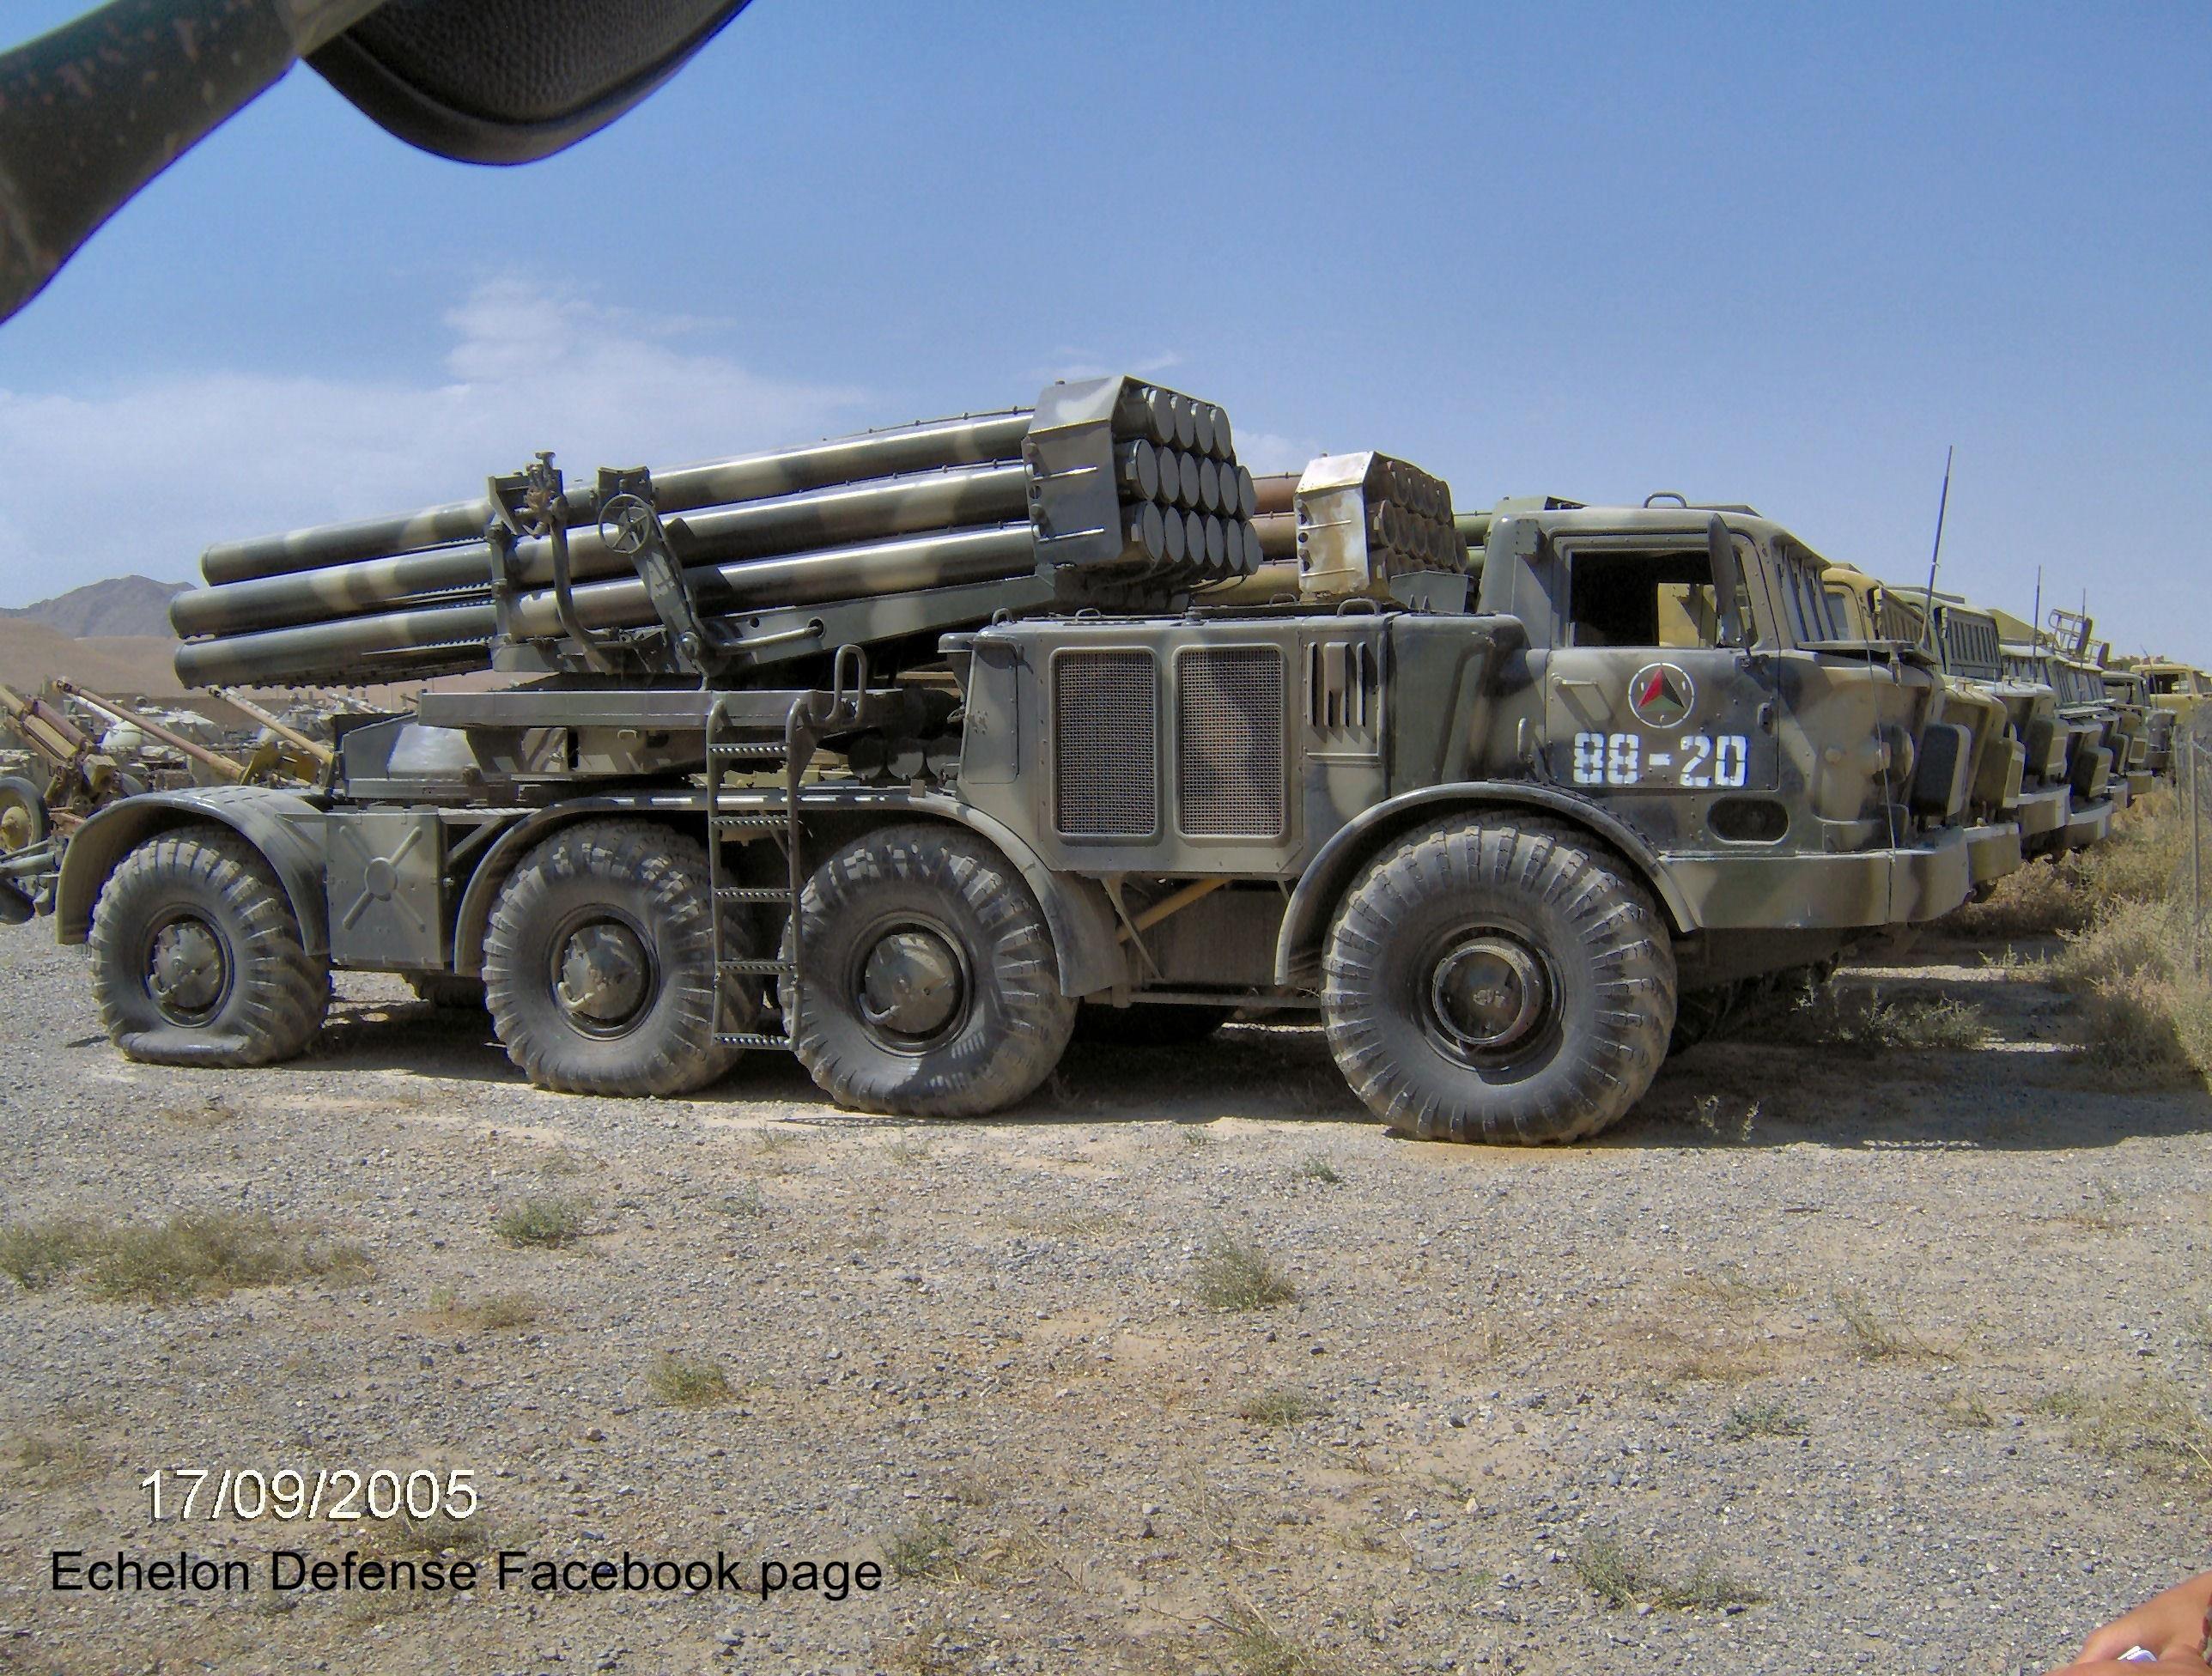 Russian MRLS: Grad, Uragan, Smerch, Tornado-G/S - Page 6 G8KCVP